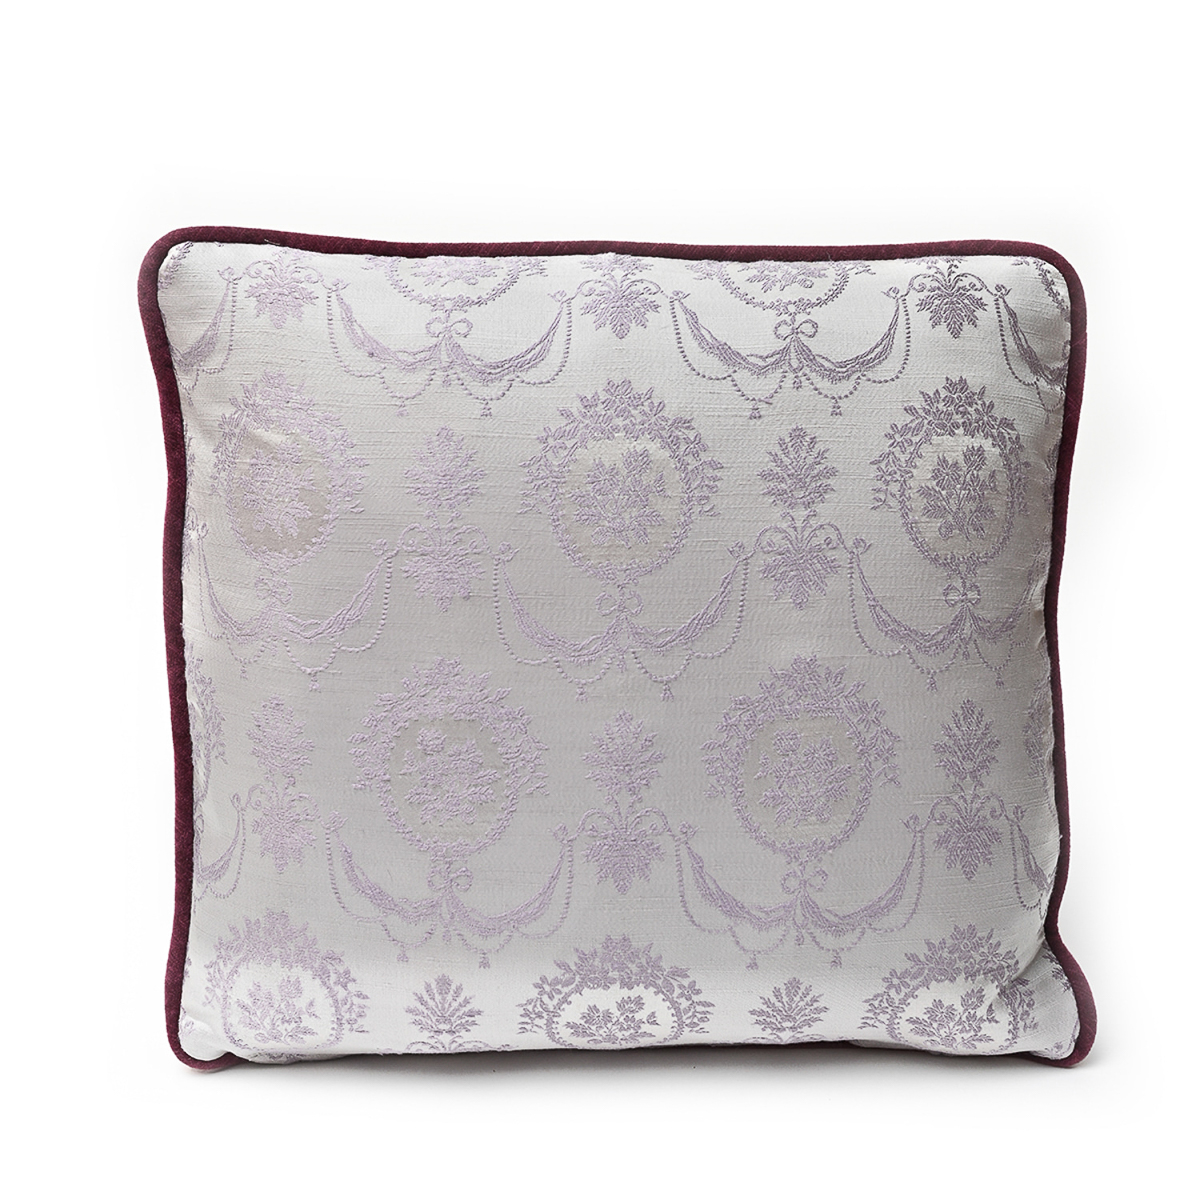 Pair Of Pillows, Lilac Bouquet: 18 x 18